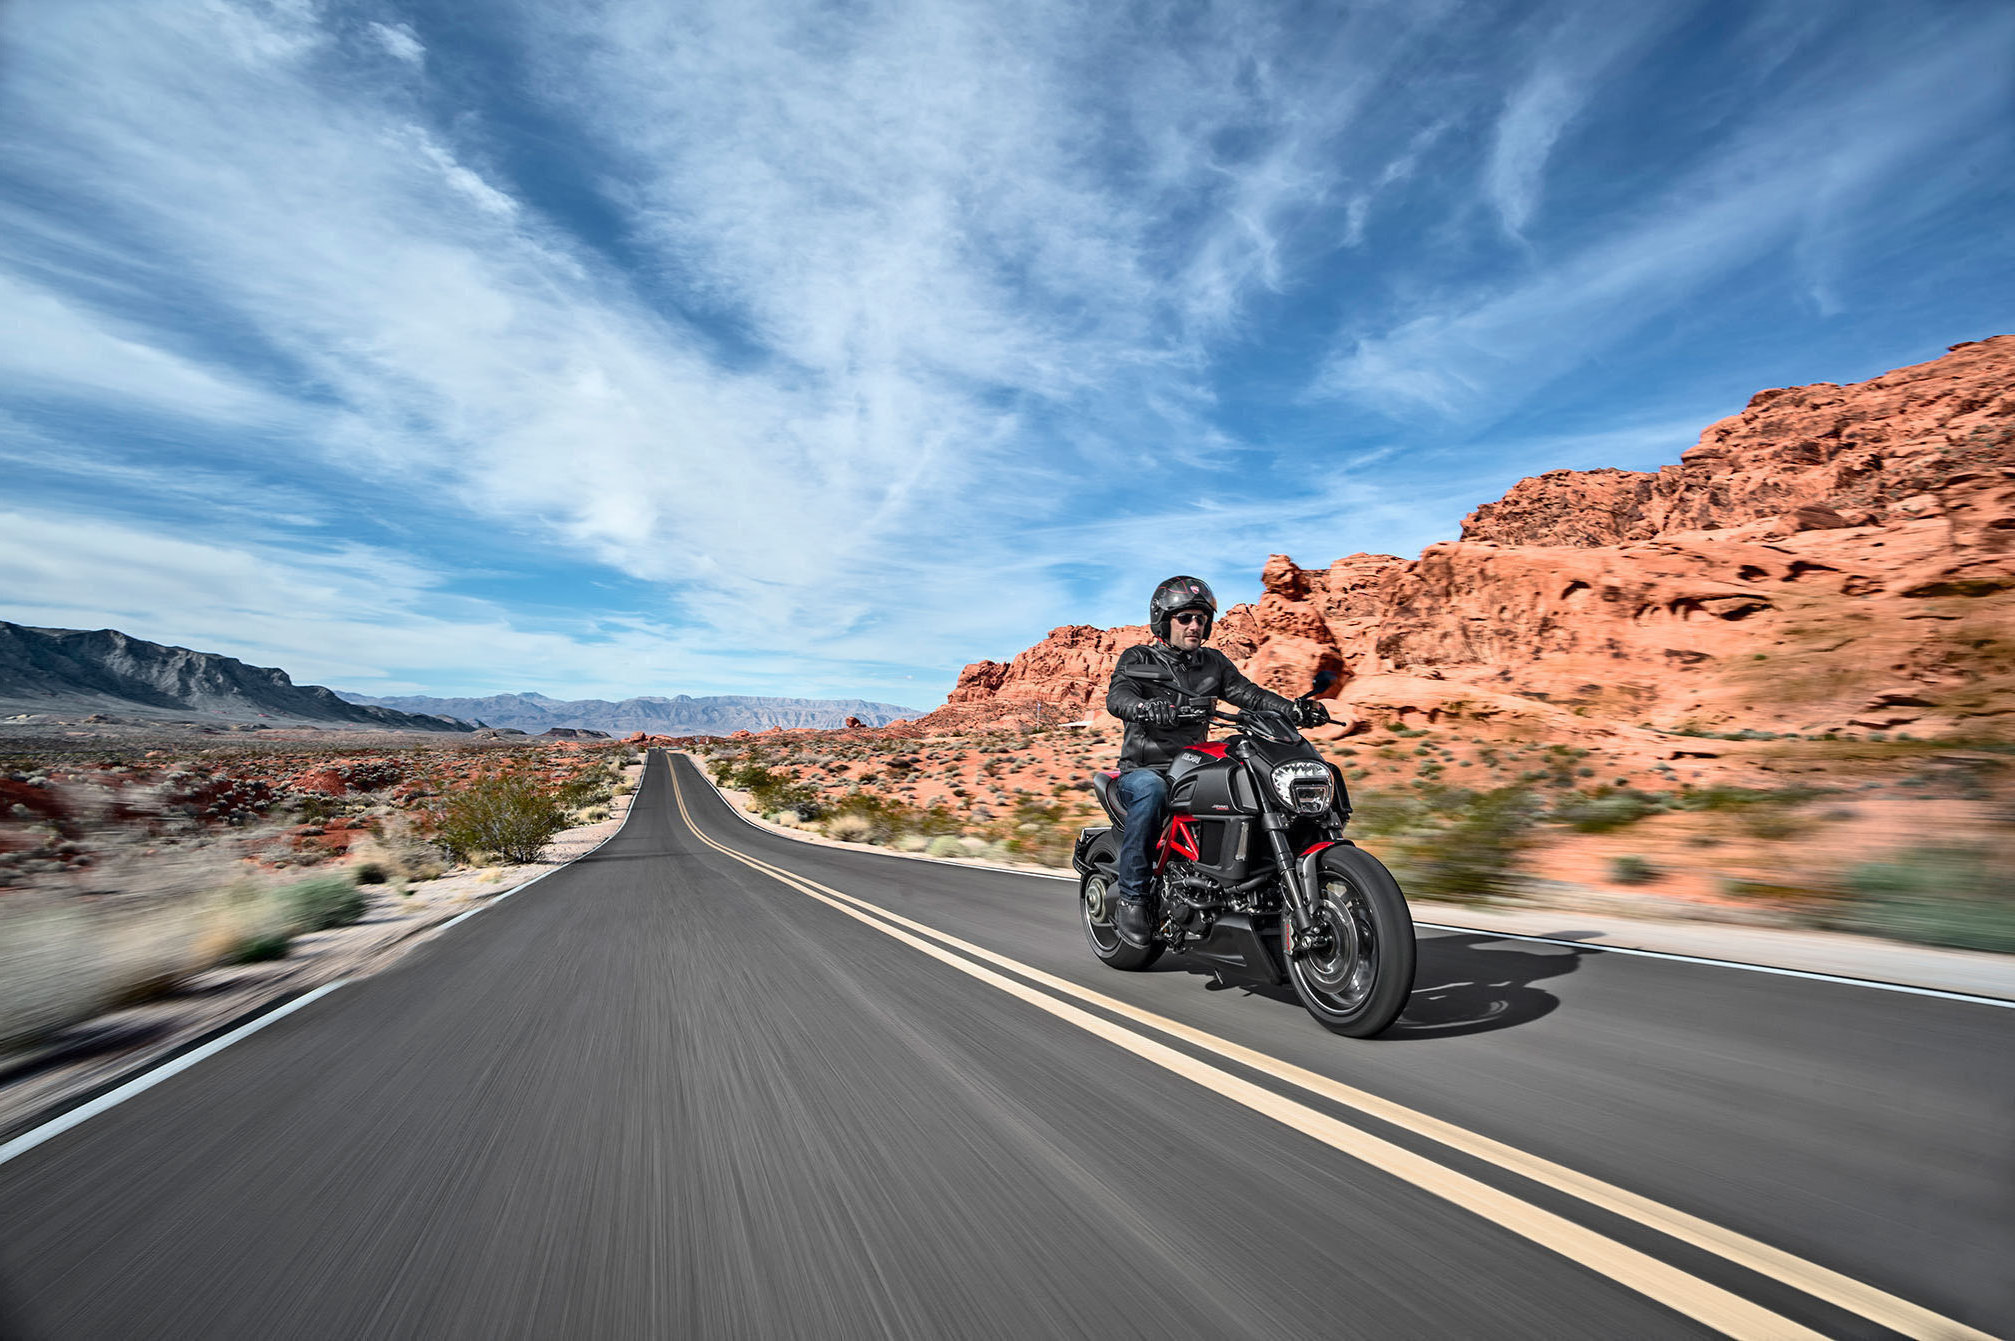 2015 Ducati Diavel Carbon Desktop Background Wallpaper - Freeway , HD Wallpaper & Backgrounds